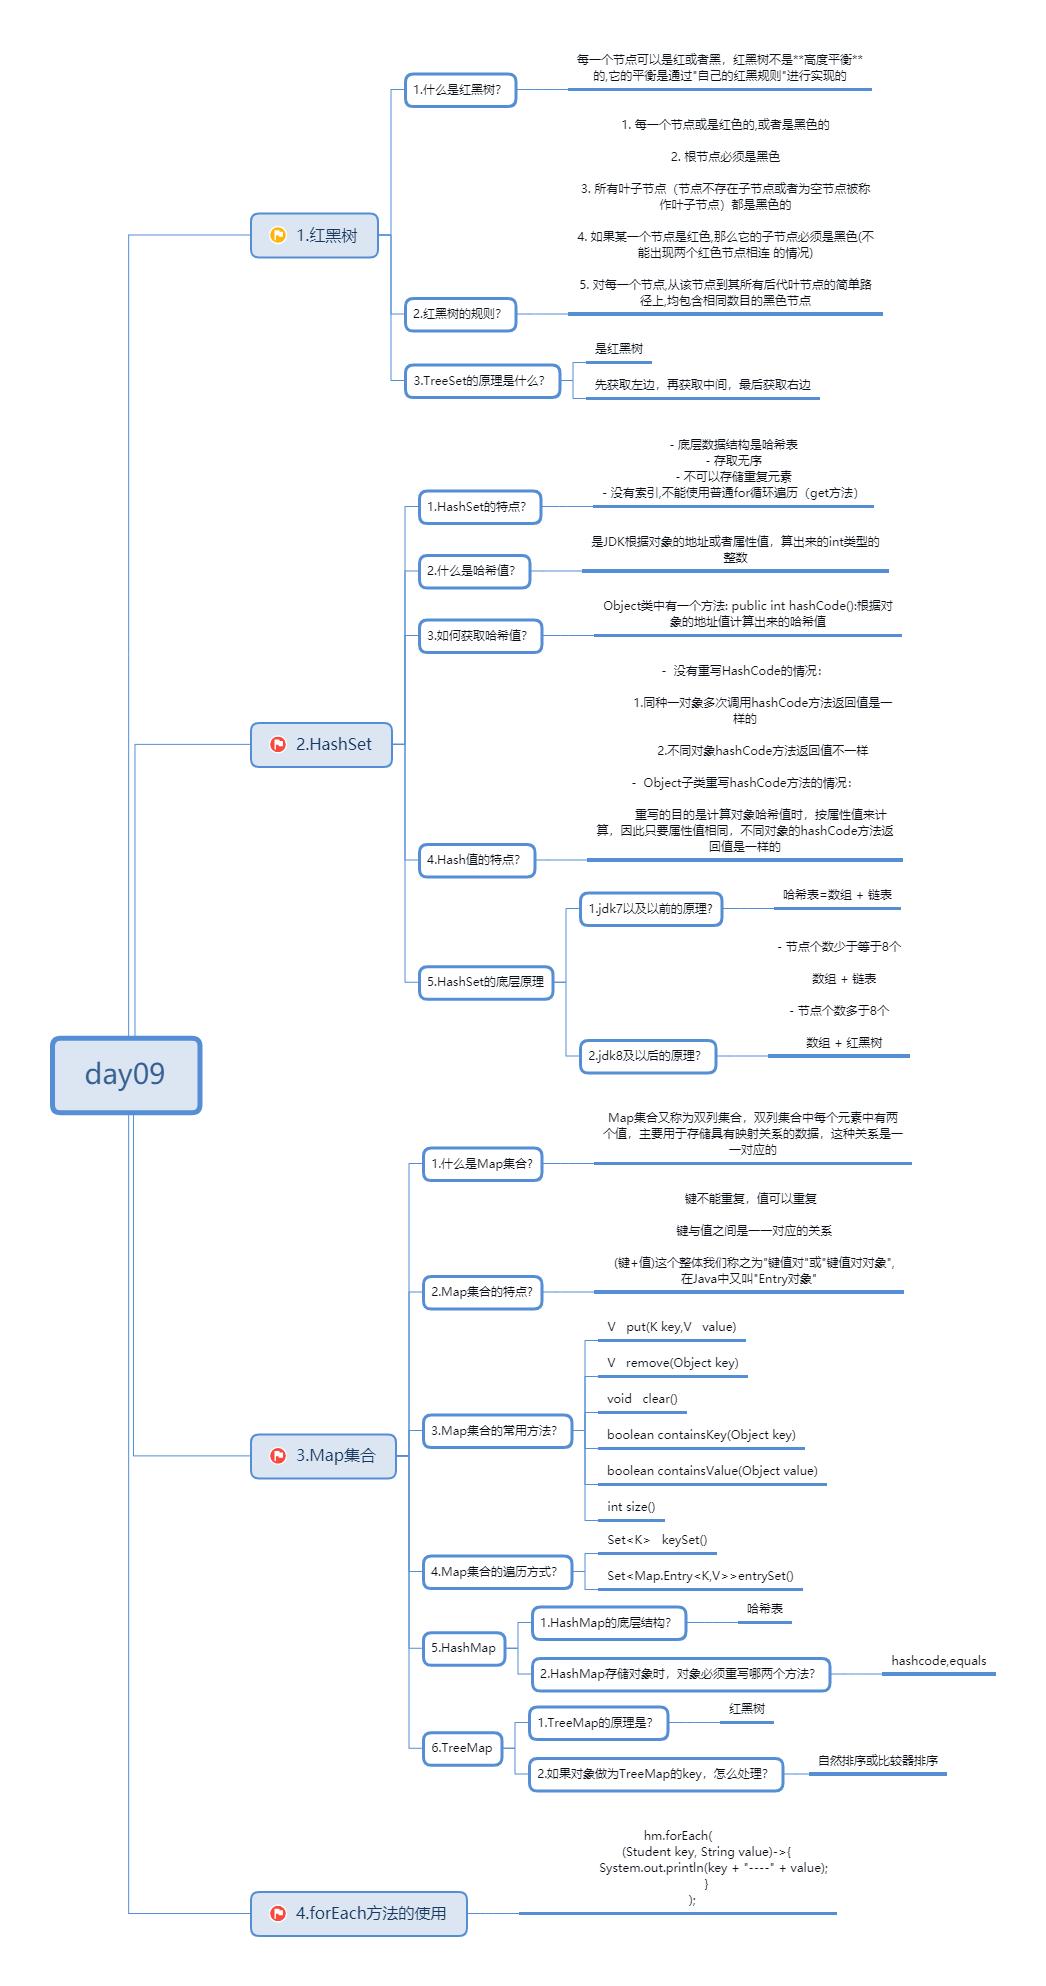 Java进阶基础18天课程大总结